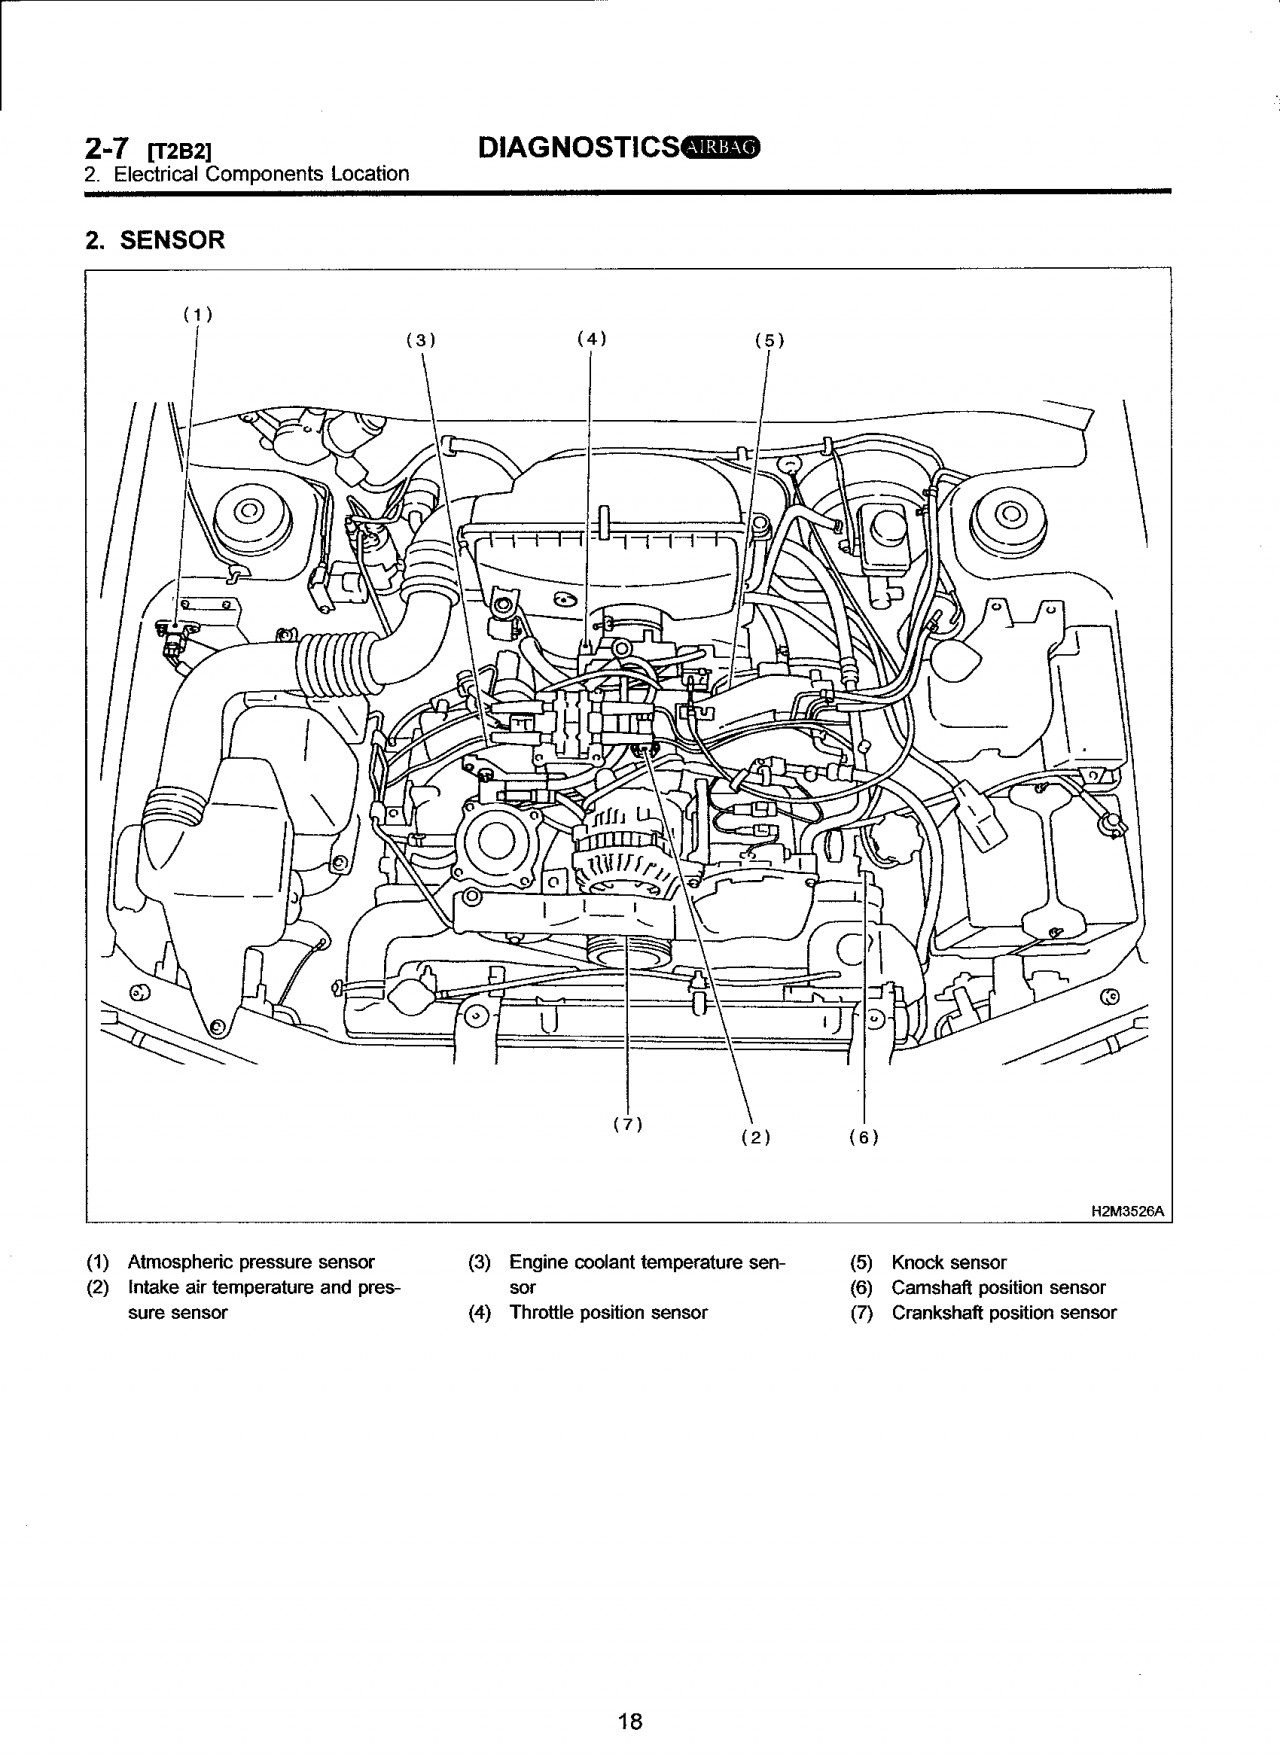 wiring diagram , honda rebel 125 250 450 e2 80 a2 view topic wiring  diagrams , 1996 chevy s10 wiper wiring diagram , toyota 3 0 engine diagram  air valve